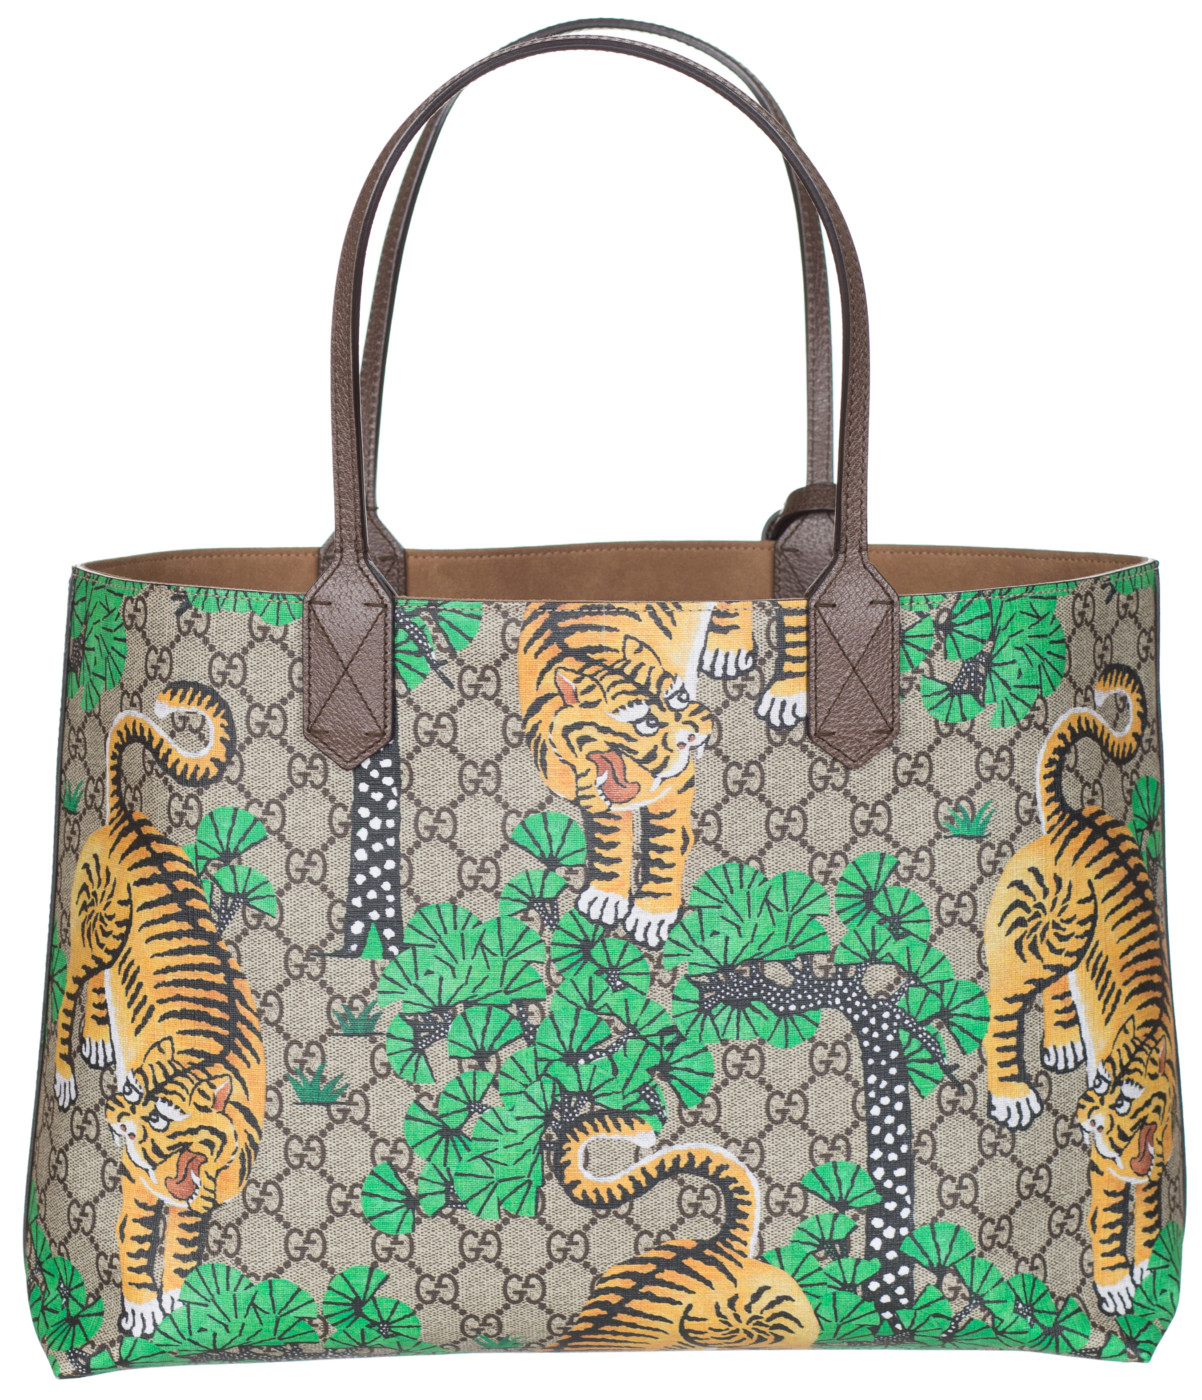 7c4e65a2d75e7a Gucci GG Supreme Leather Bengal Tiger Tote Shoulder Bag